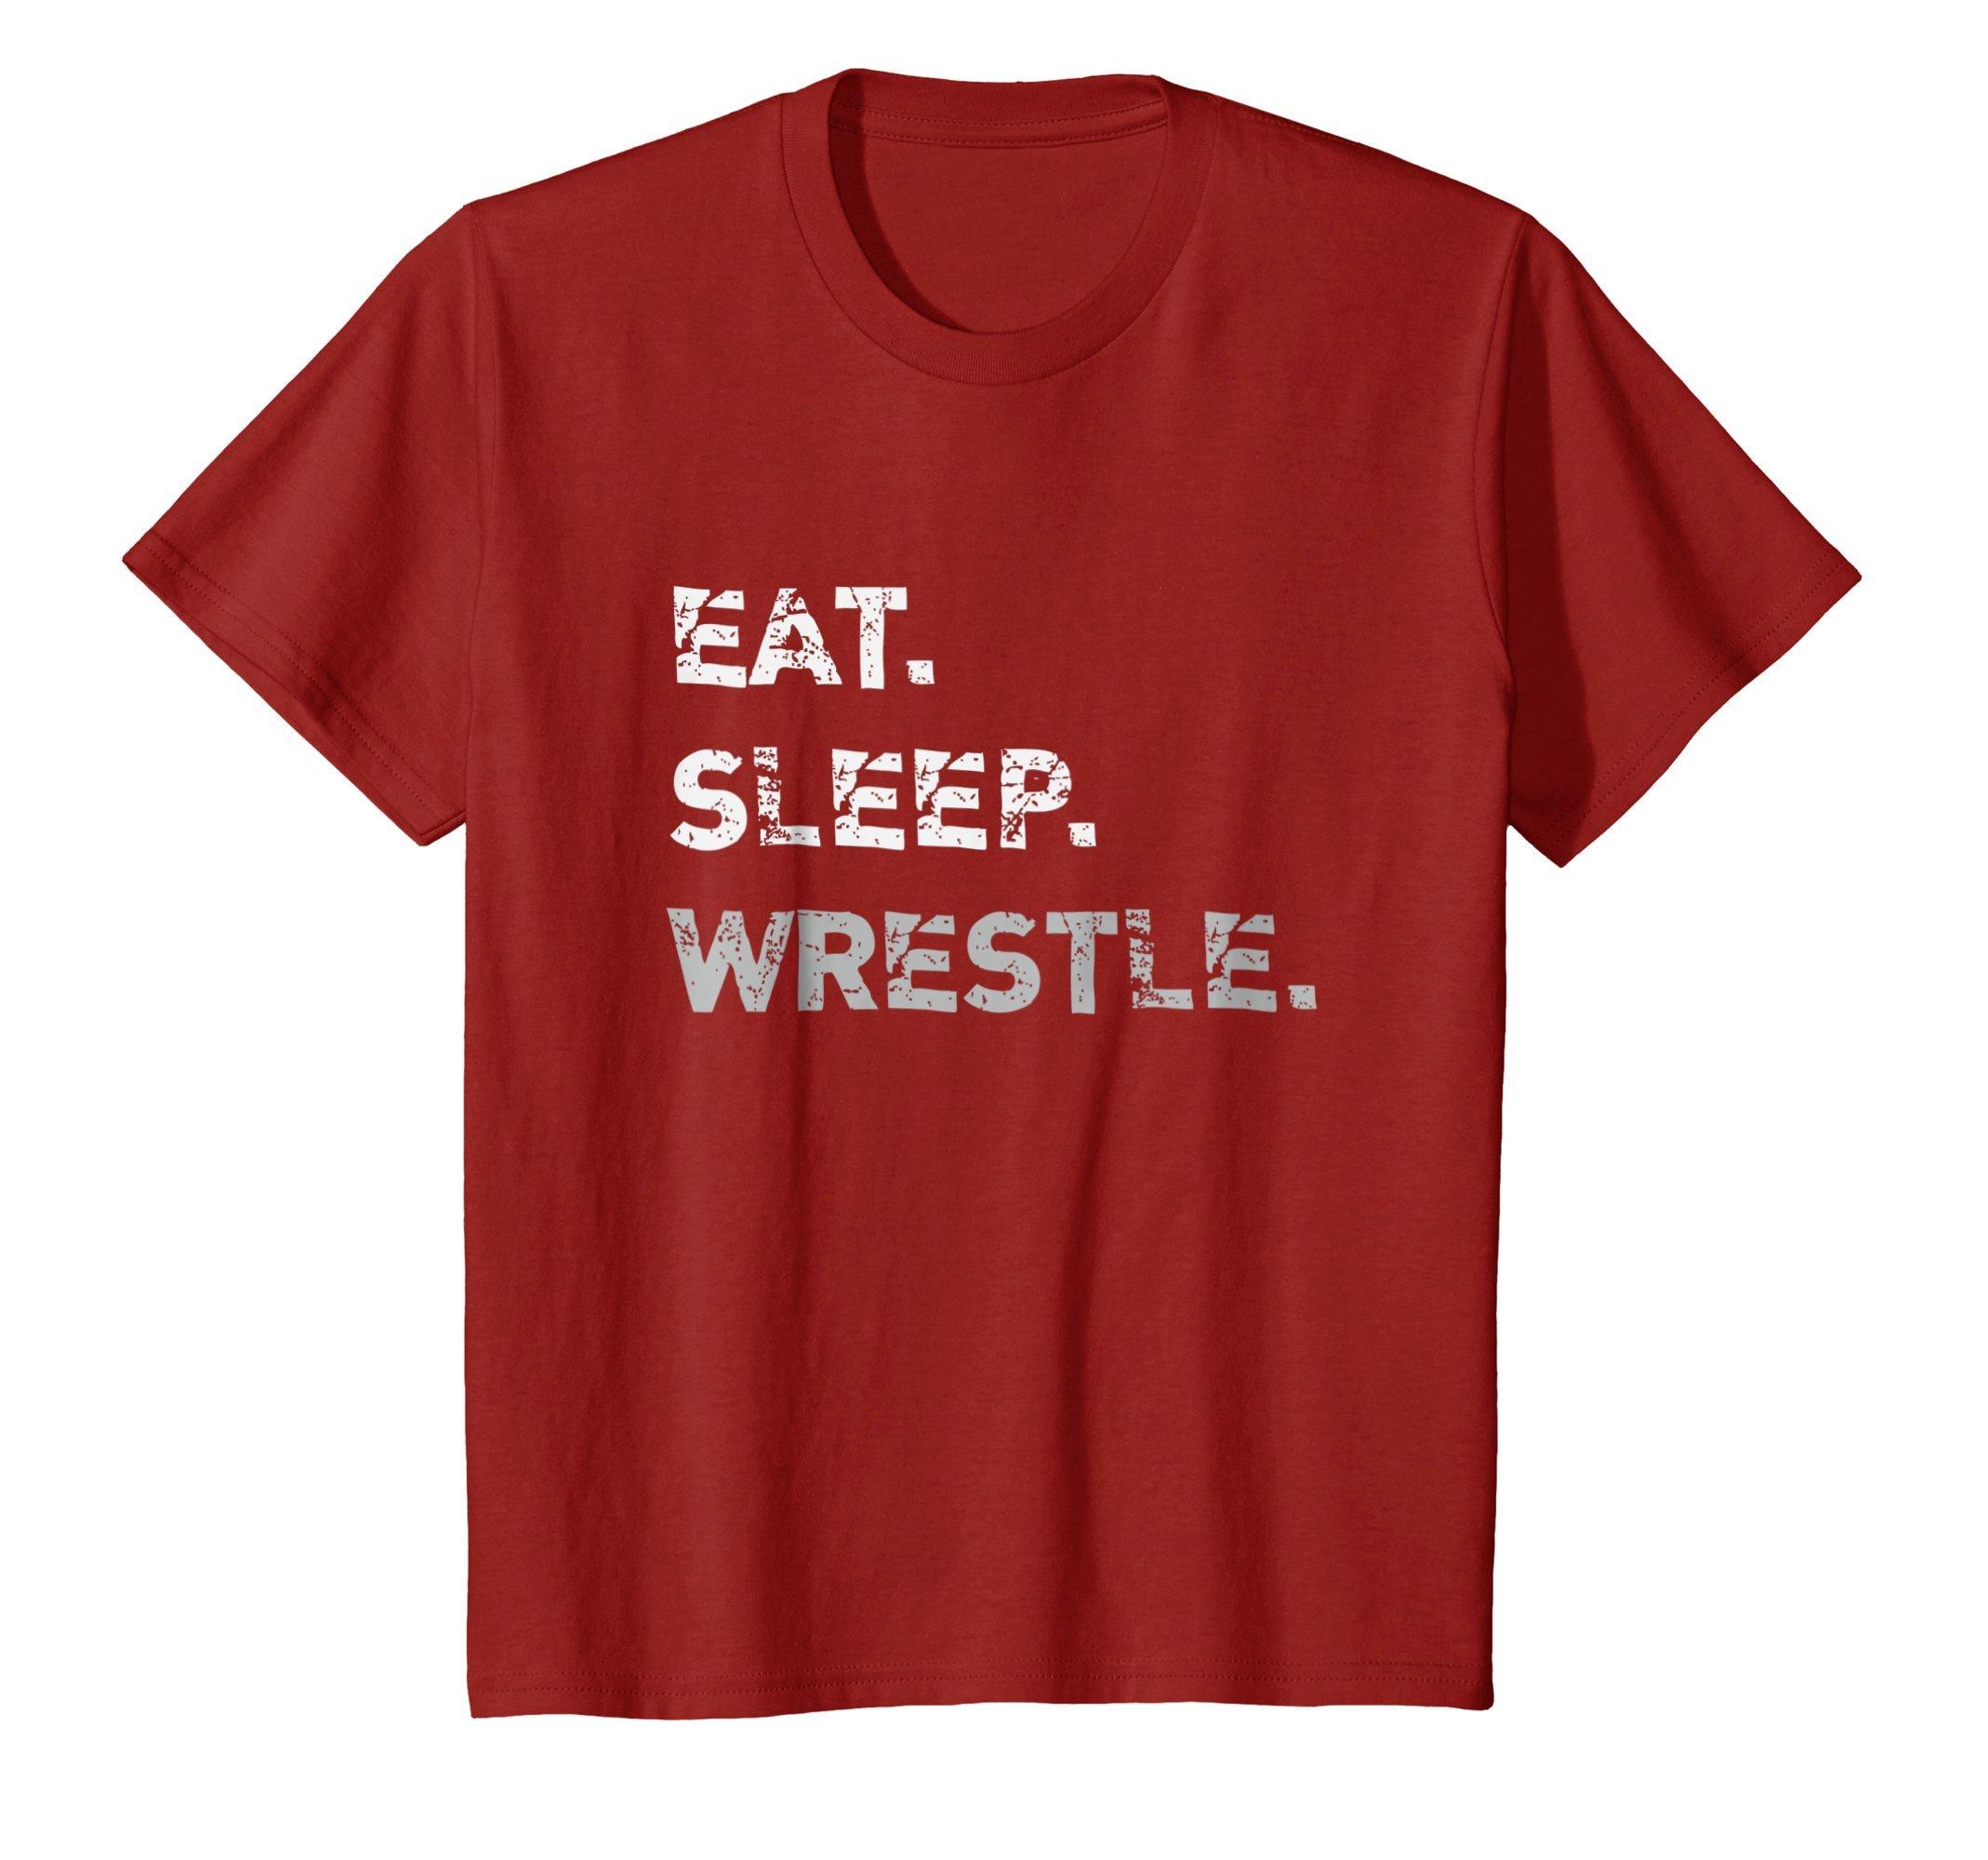 Kids Eat Sleep Wrestle Wrestling T-Shirt 8 Cranberry